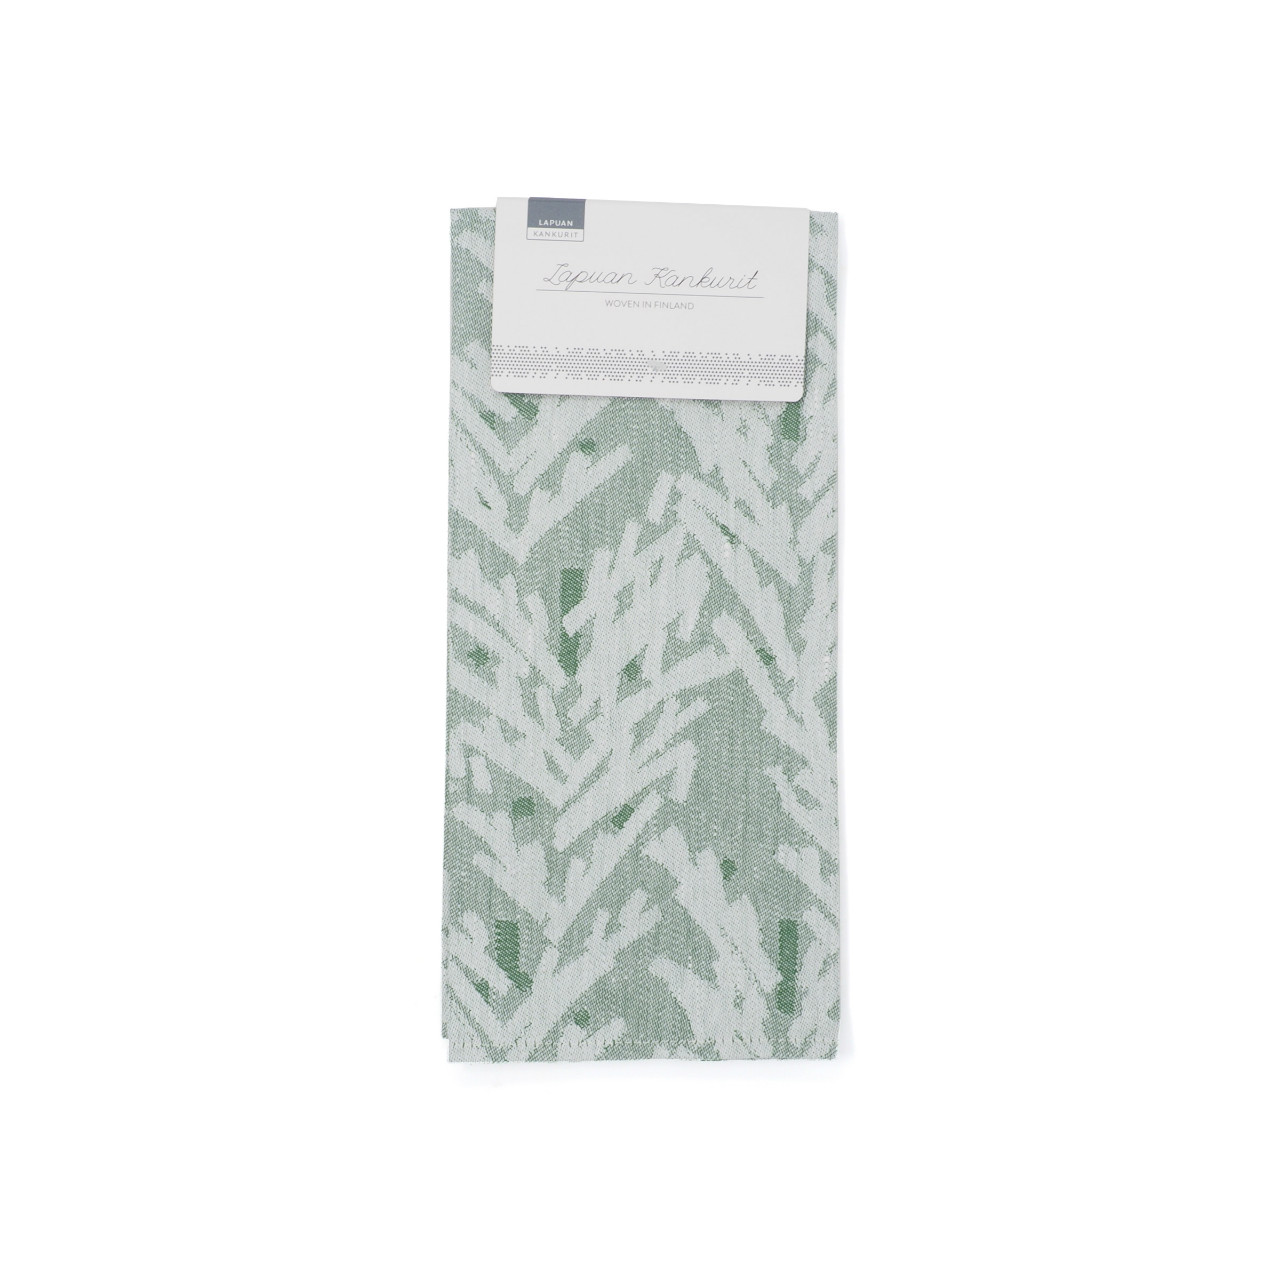 KUUSI towel(white / moss)LAPUAN KANKURIT ラプアンカンクリ